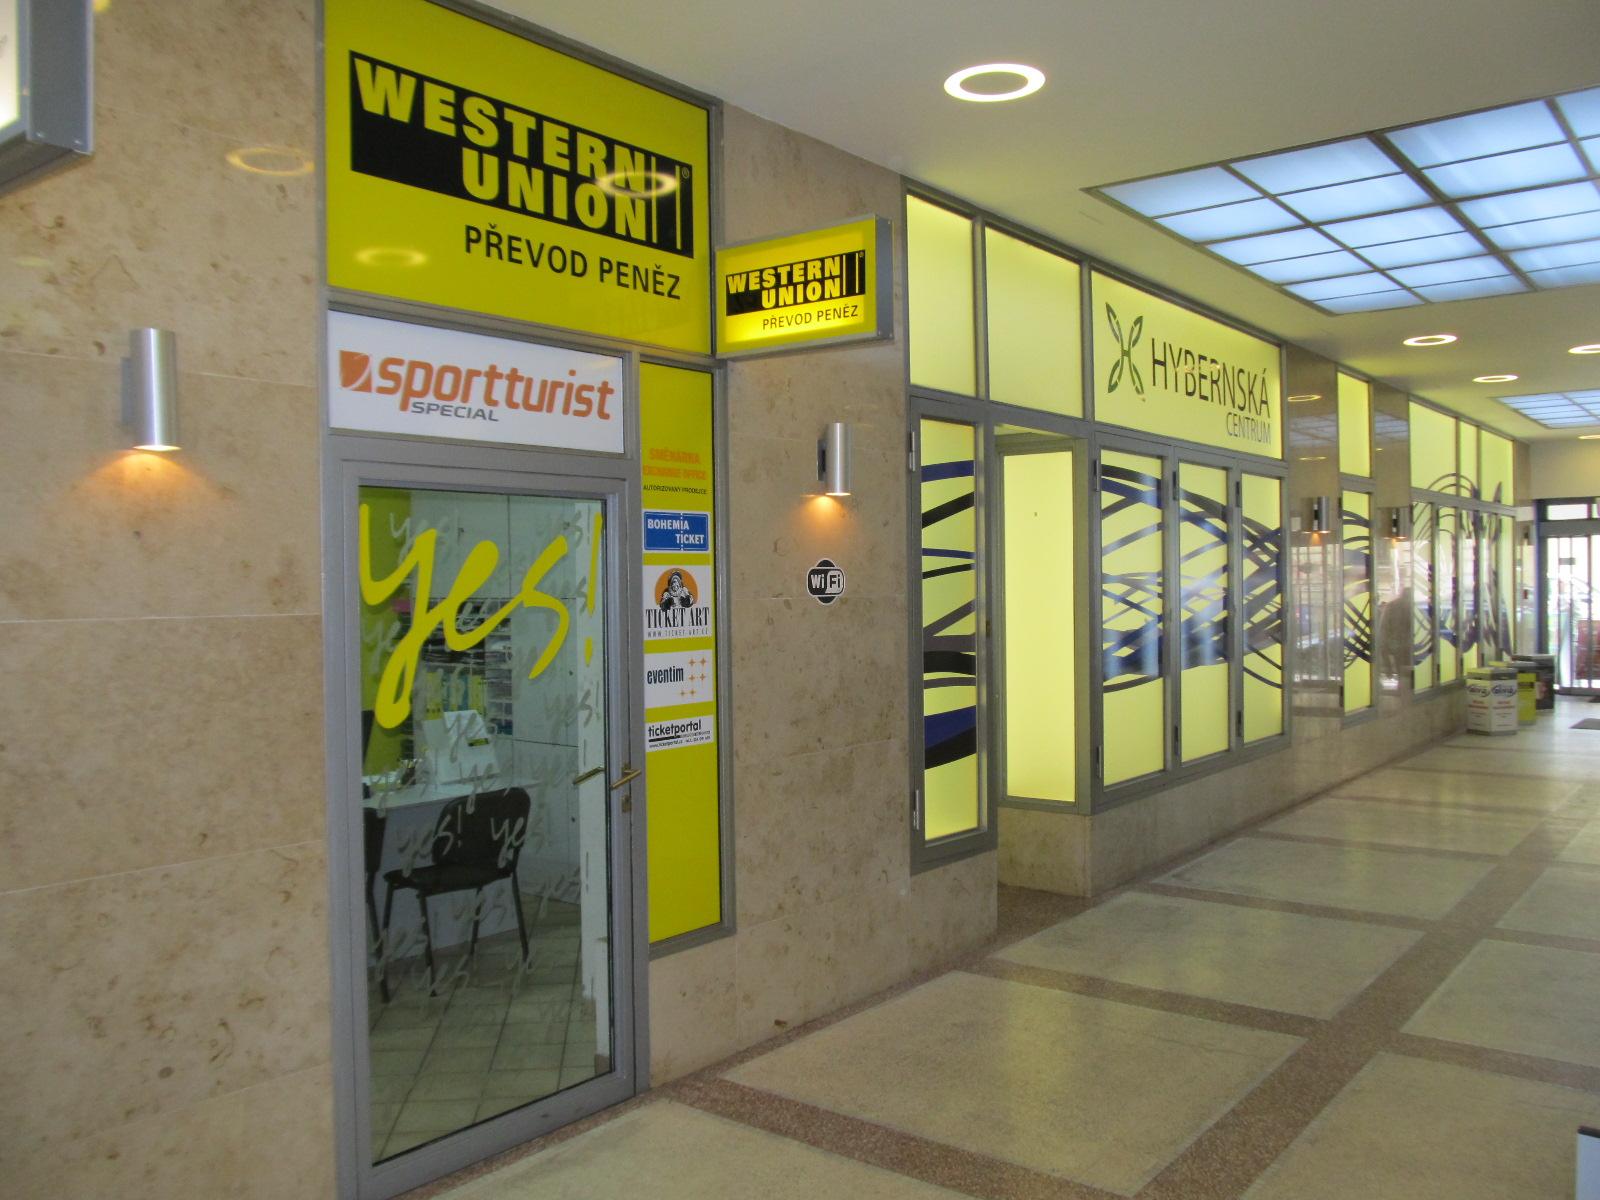 Ticketportal ticket office, Western Union, Prague, the Czech Republic